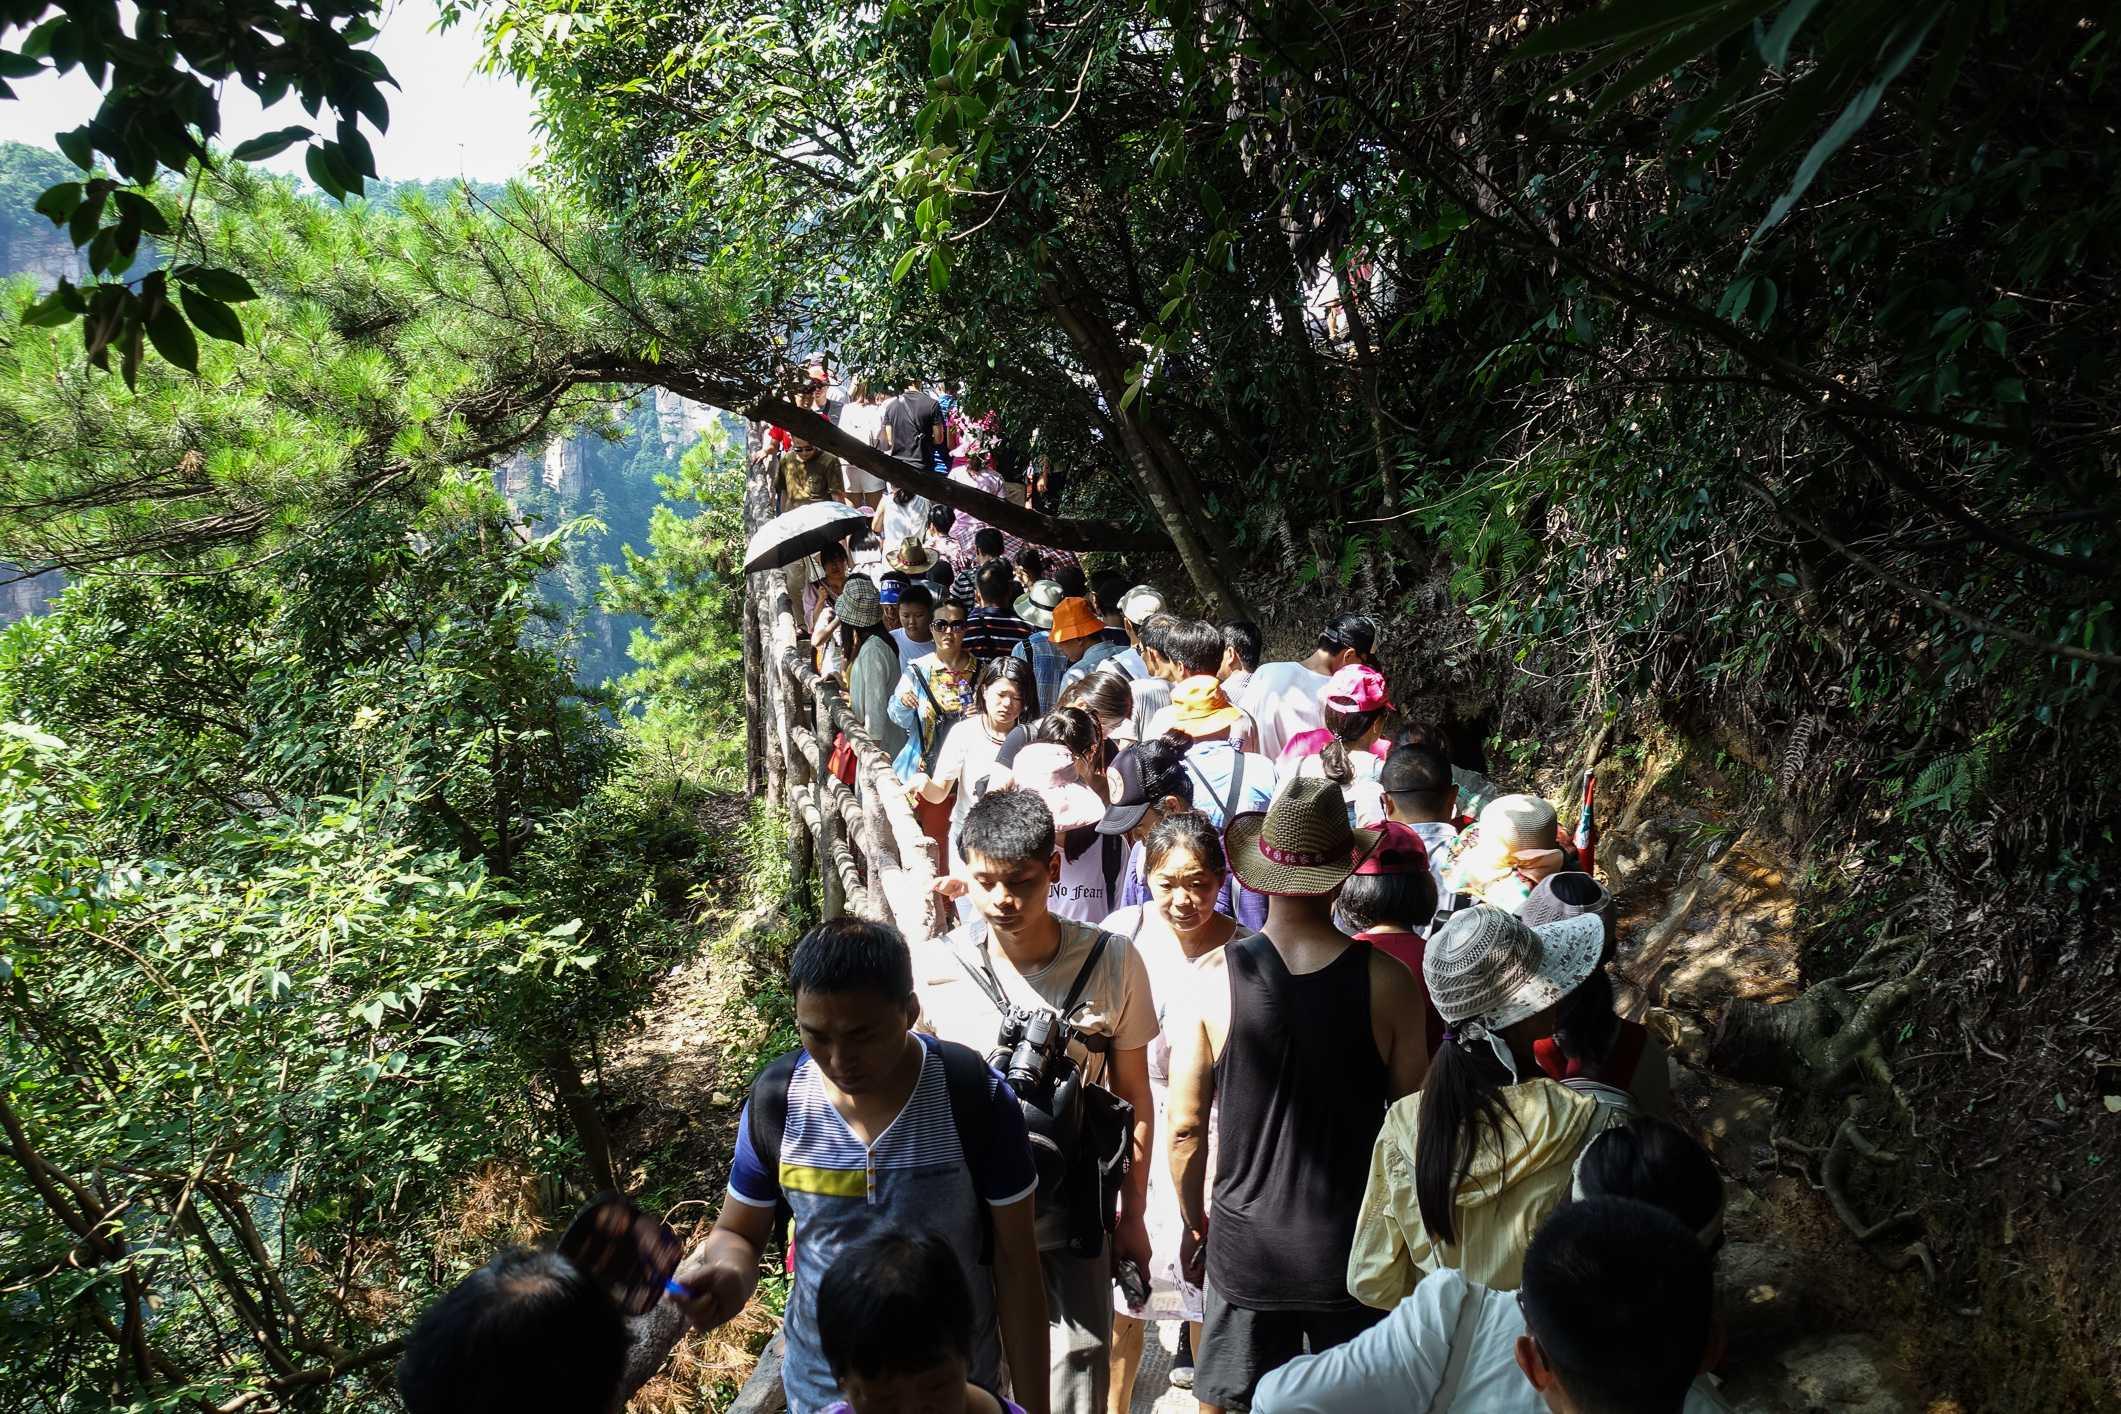 Crowds in Zhangjiajie National Forest Park